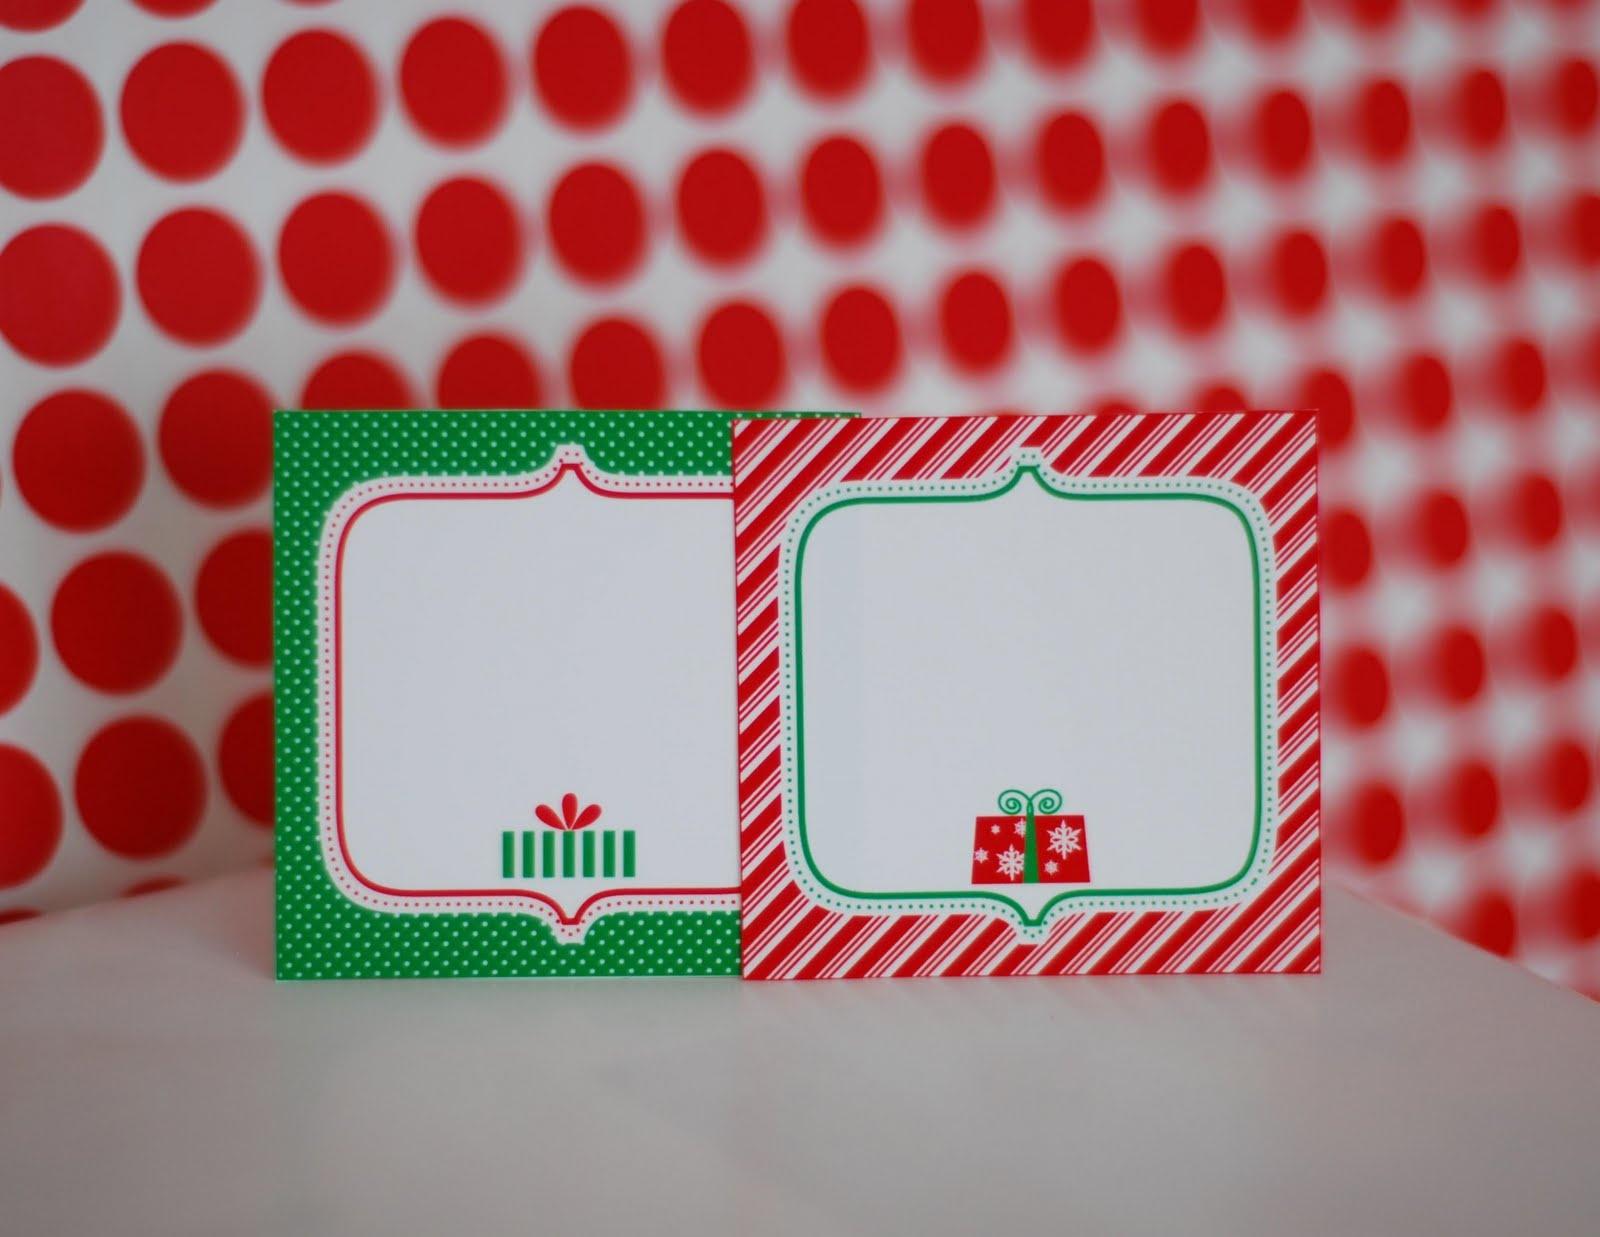 Free Christmas Food Labels Printable – Festival Collections - Free Printable Christmas Food Labels